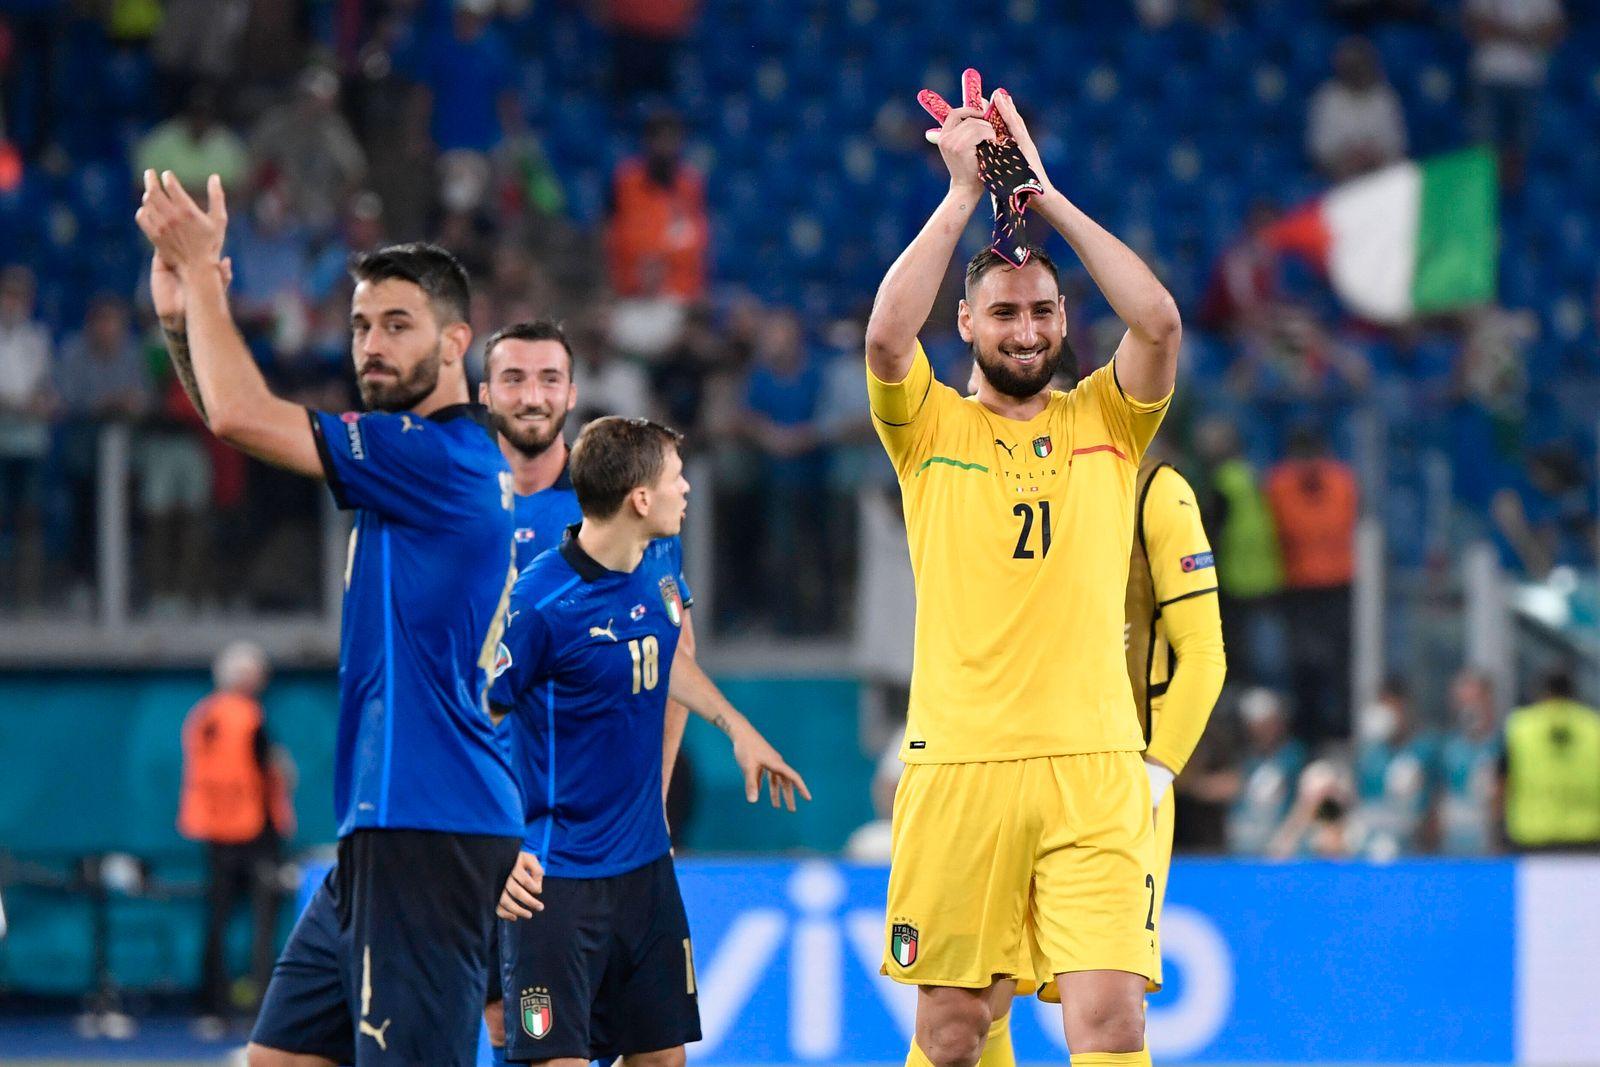 Gianluigi Donnarumma of Italy celebrates after victory the UEFA EURO, EM, Europameisterschaft,Fussball 2020 Group stage